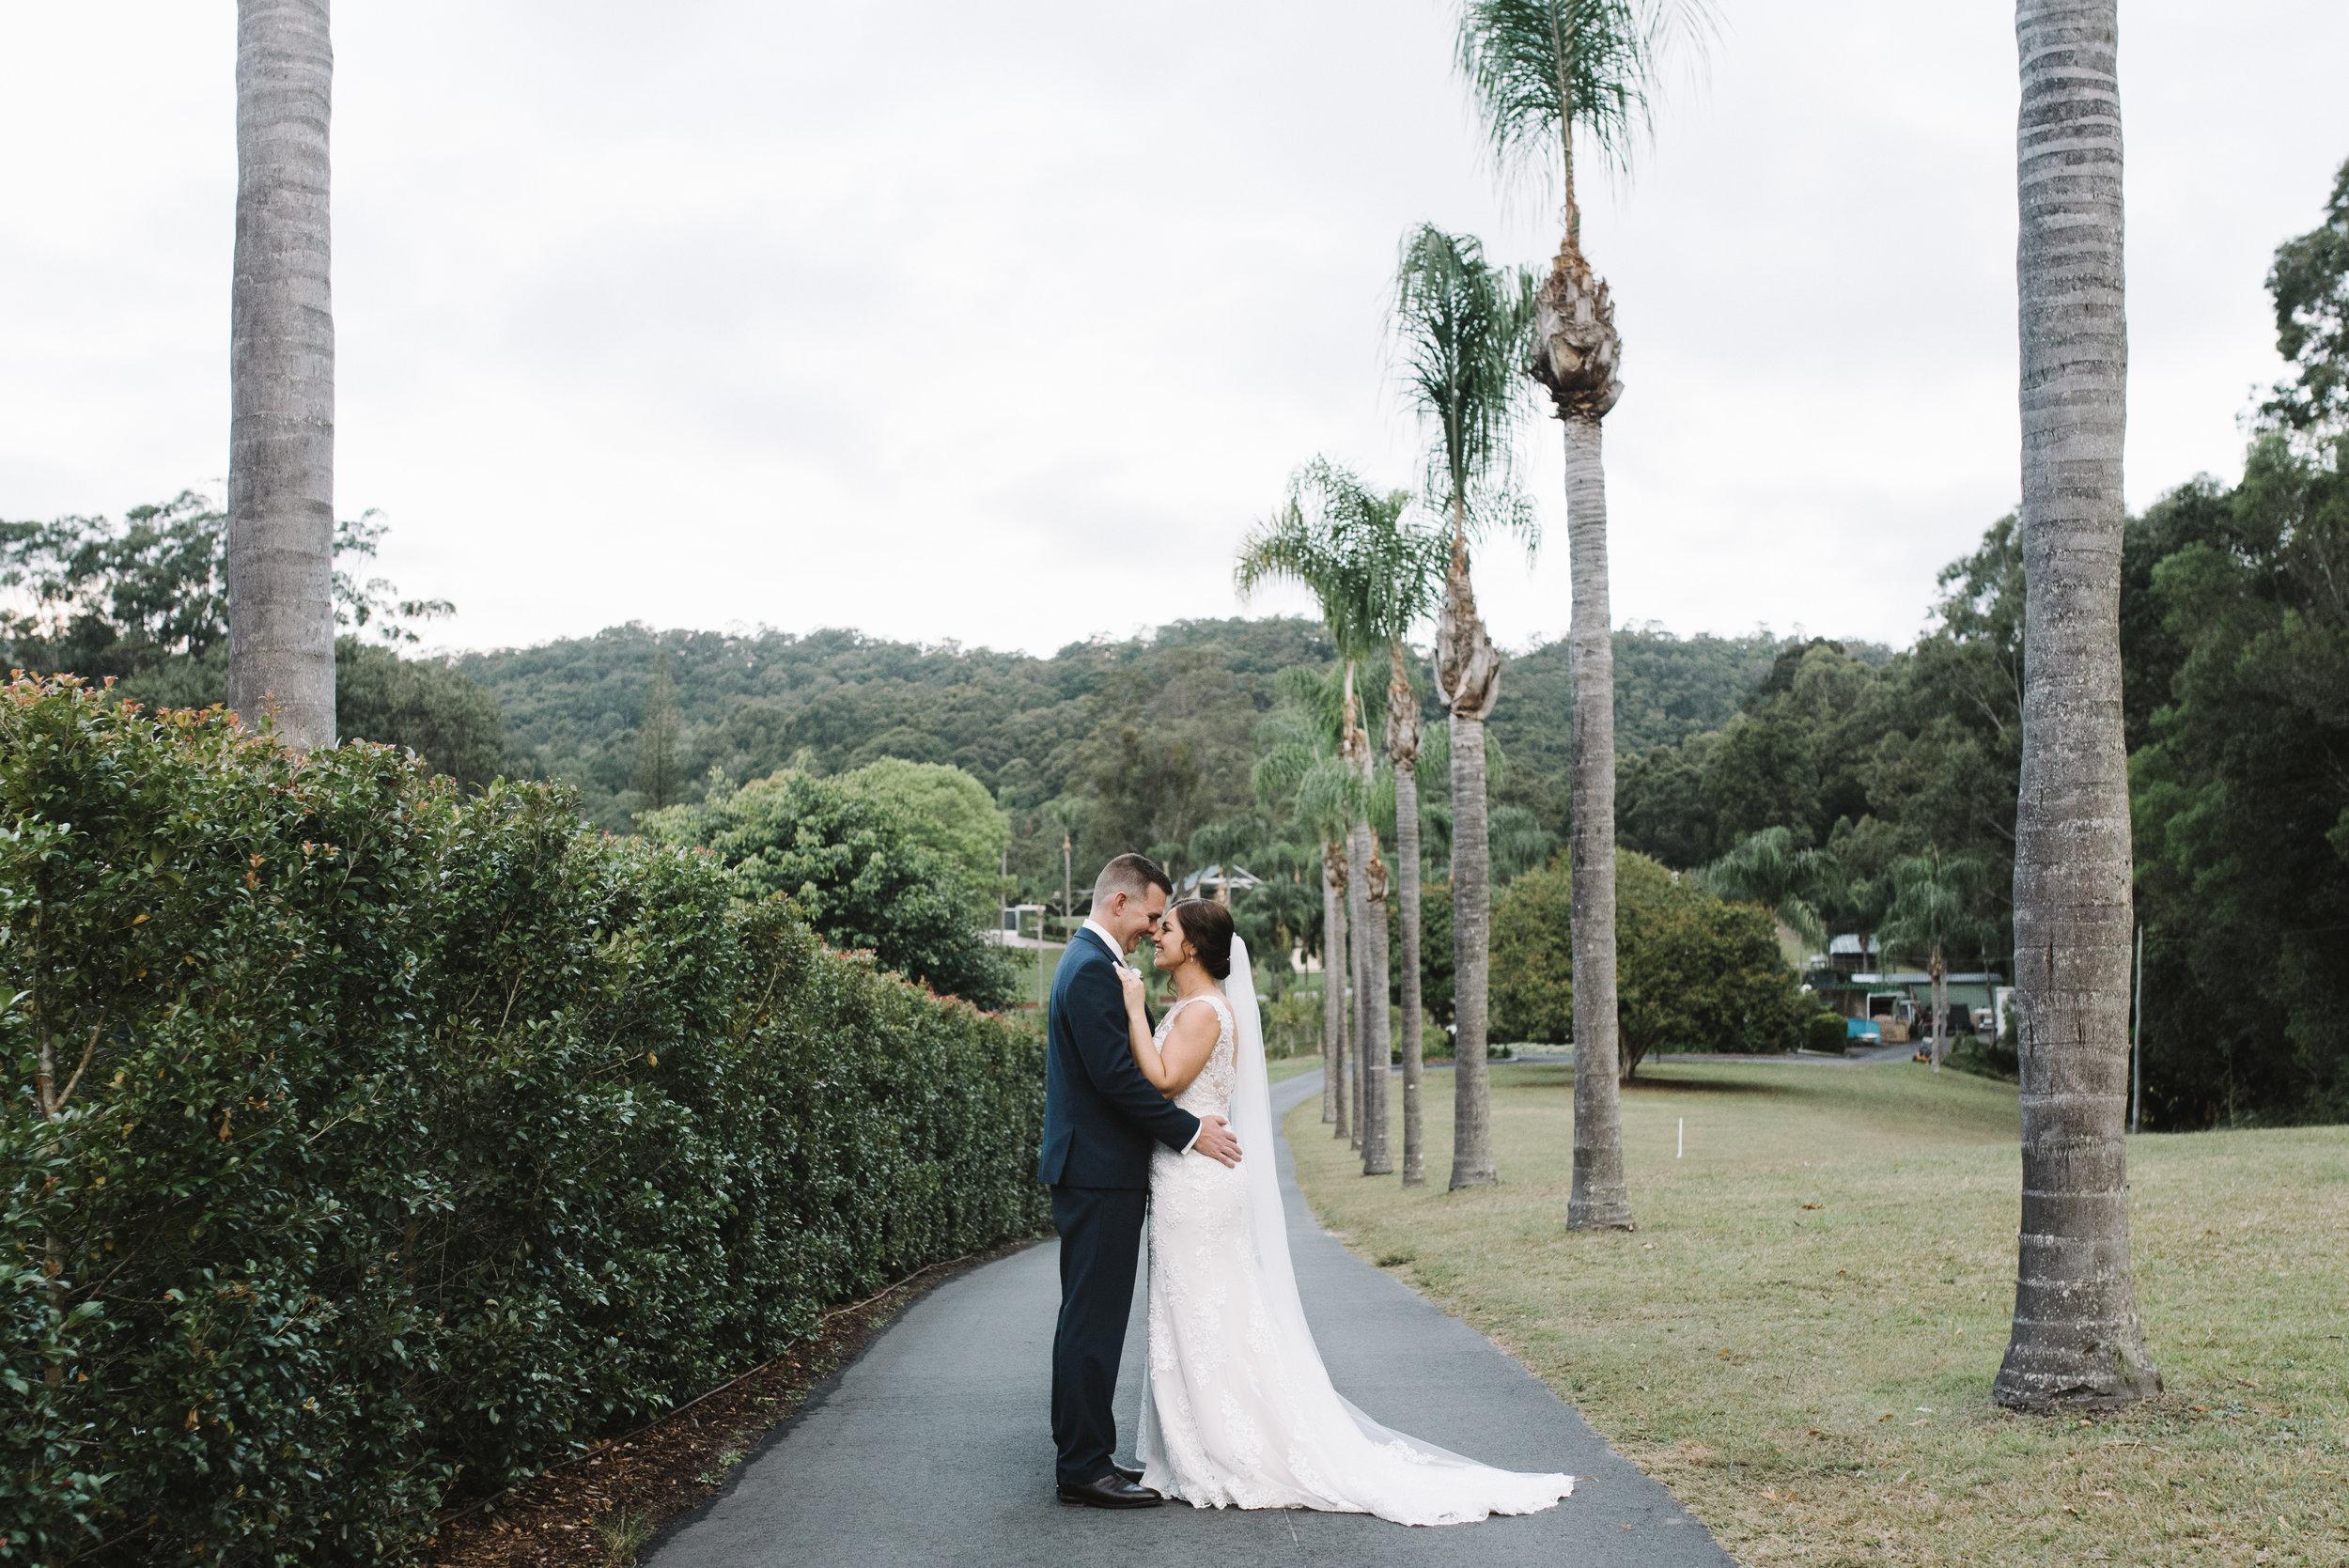 LAURENOLIVIA-austinvilla-estate-wedding-66.jpg